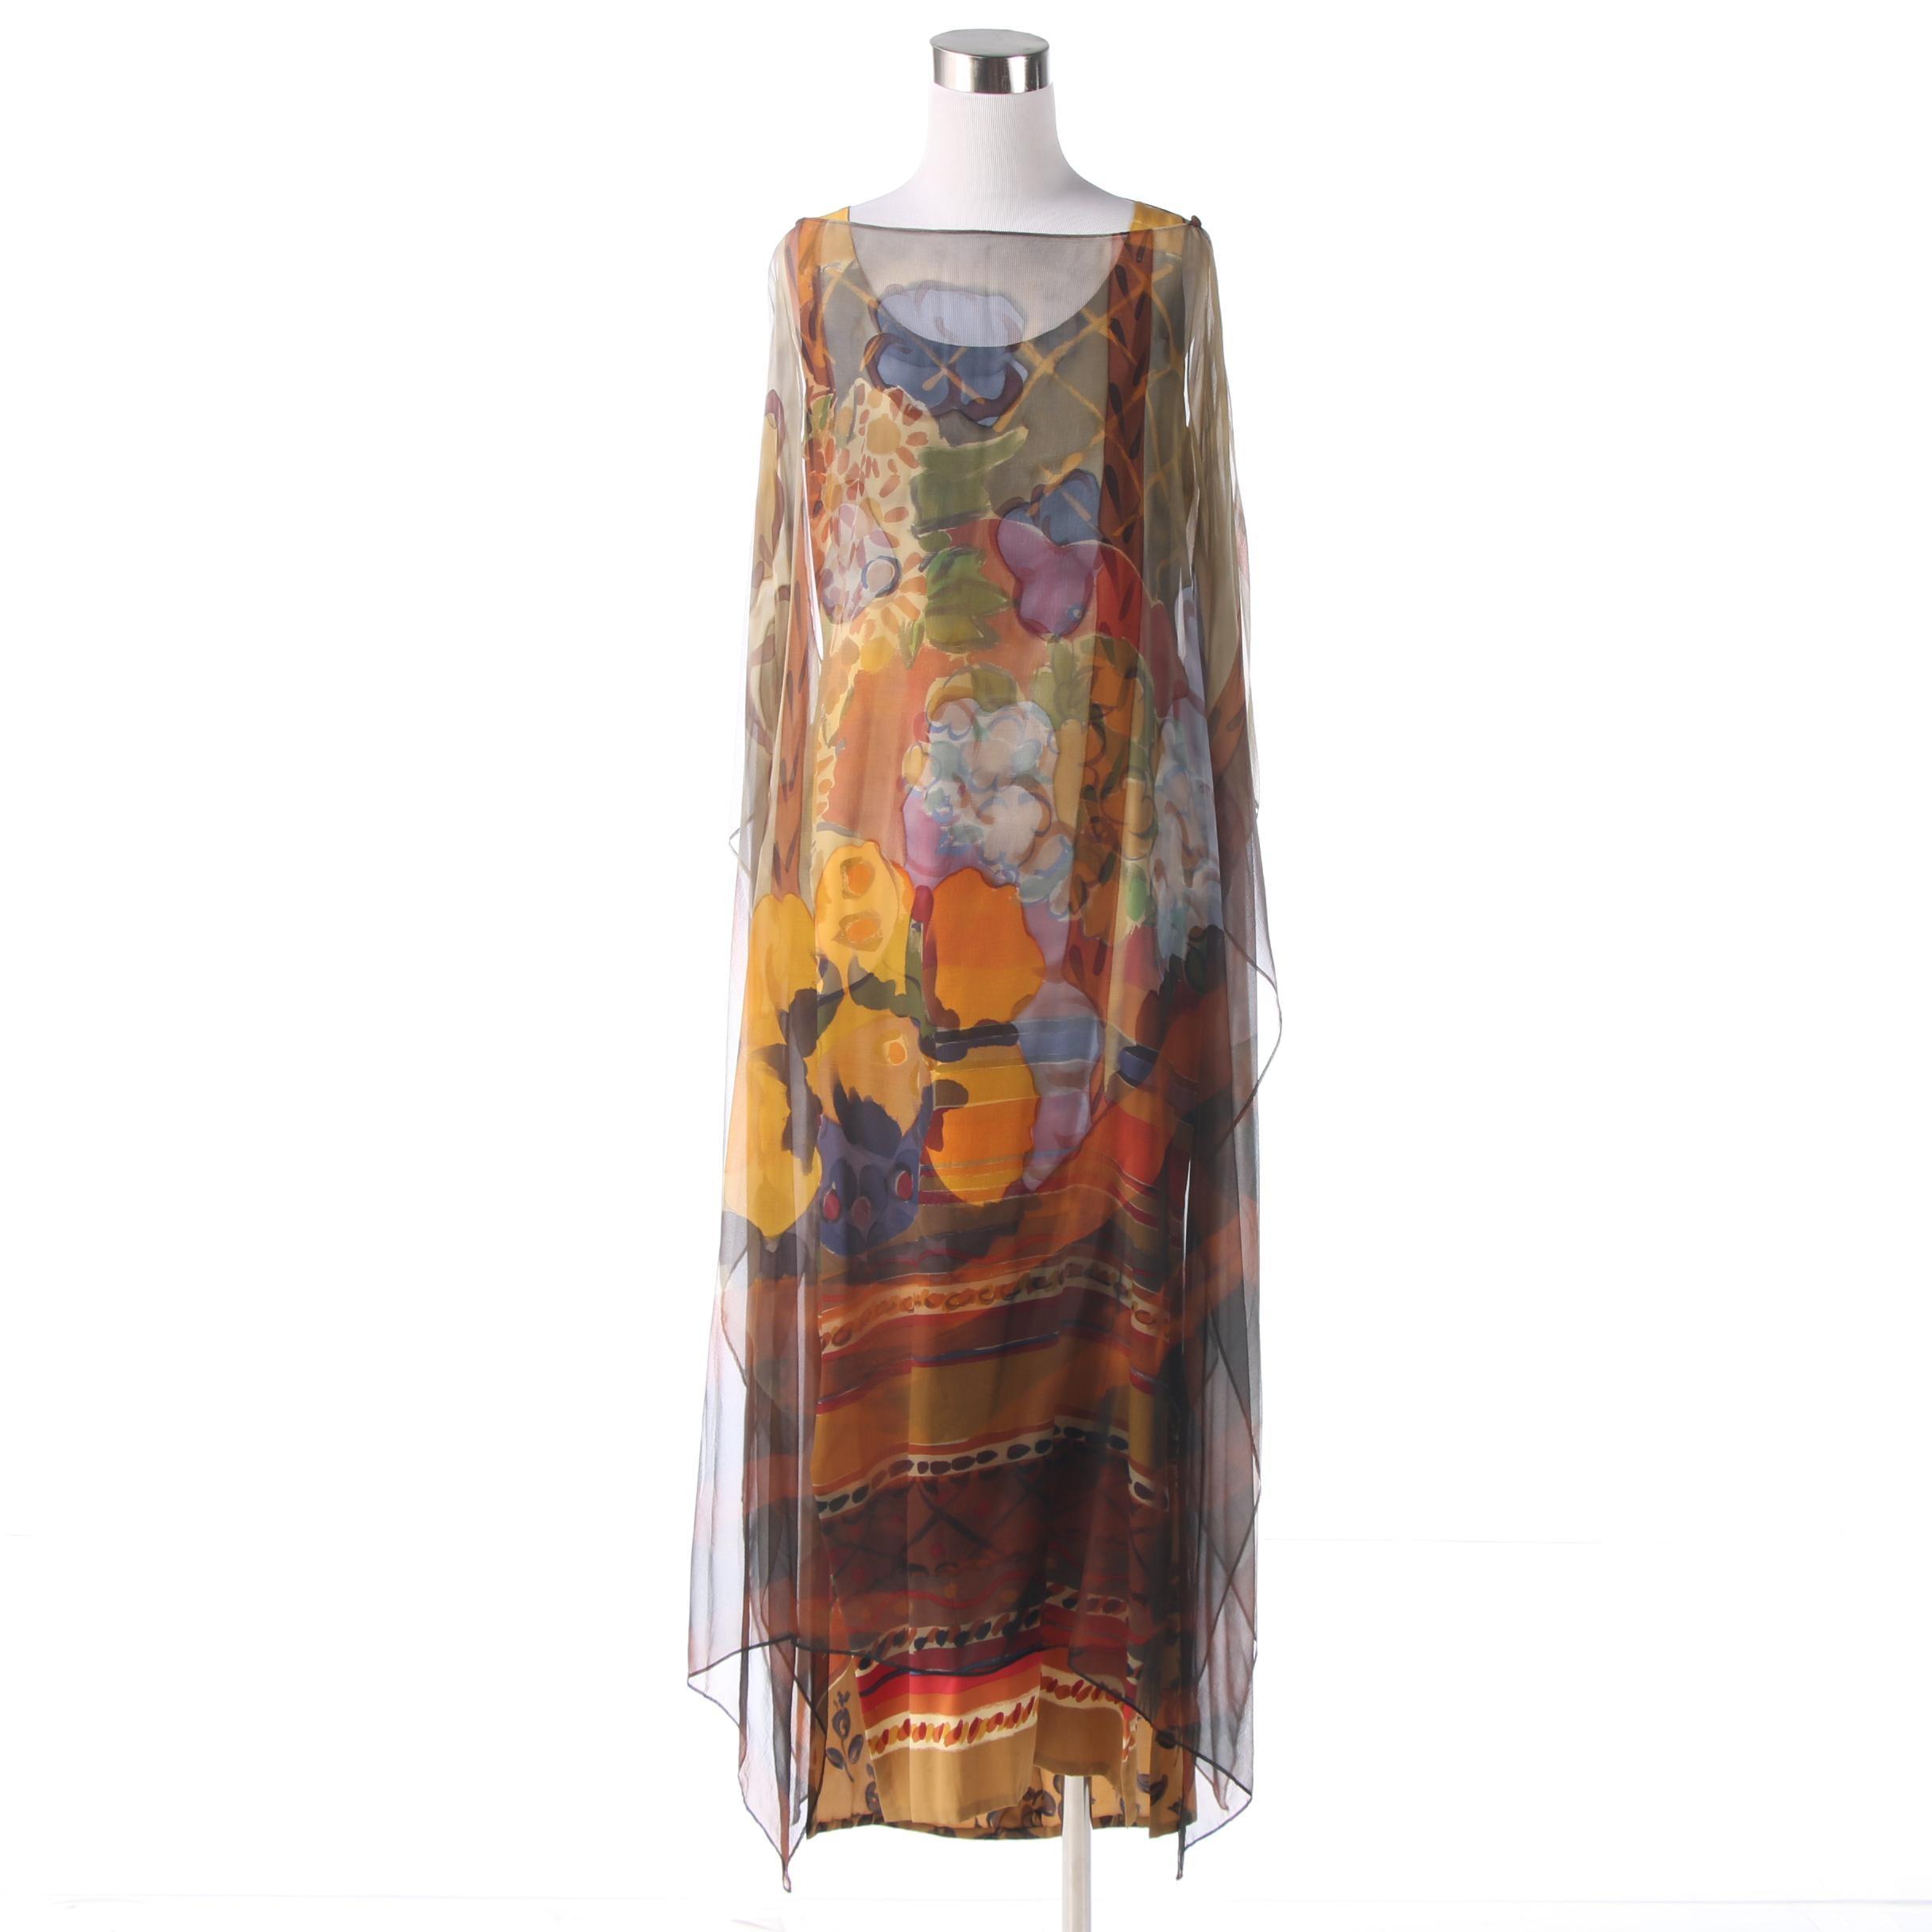 Bill Blass Mixed Print Silk Dress With Sheer Overlay, Vintage